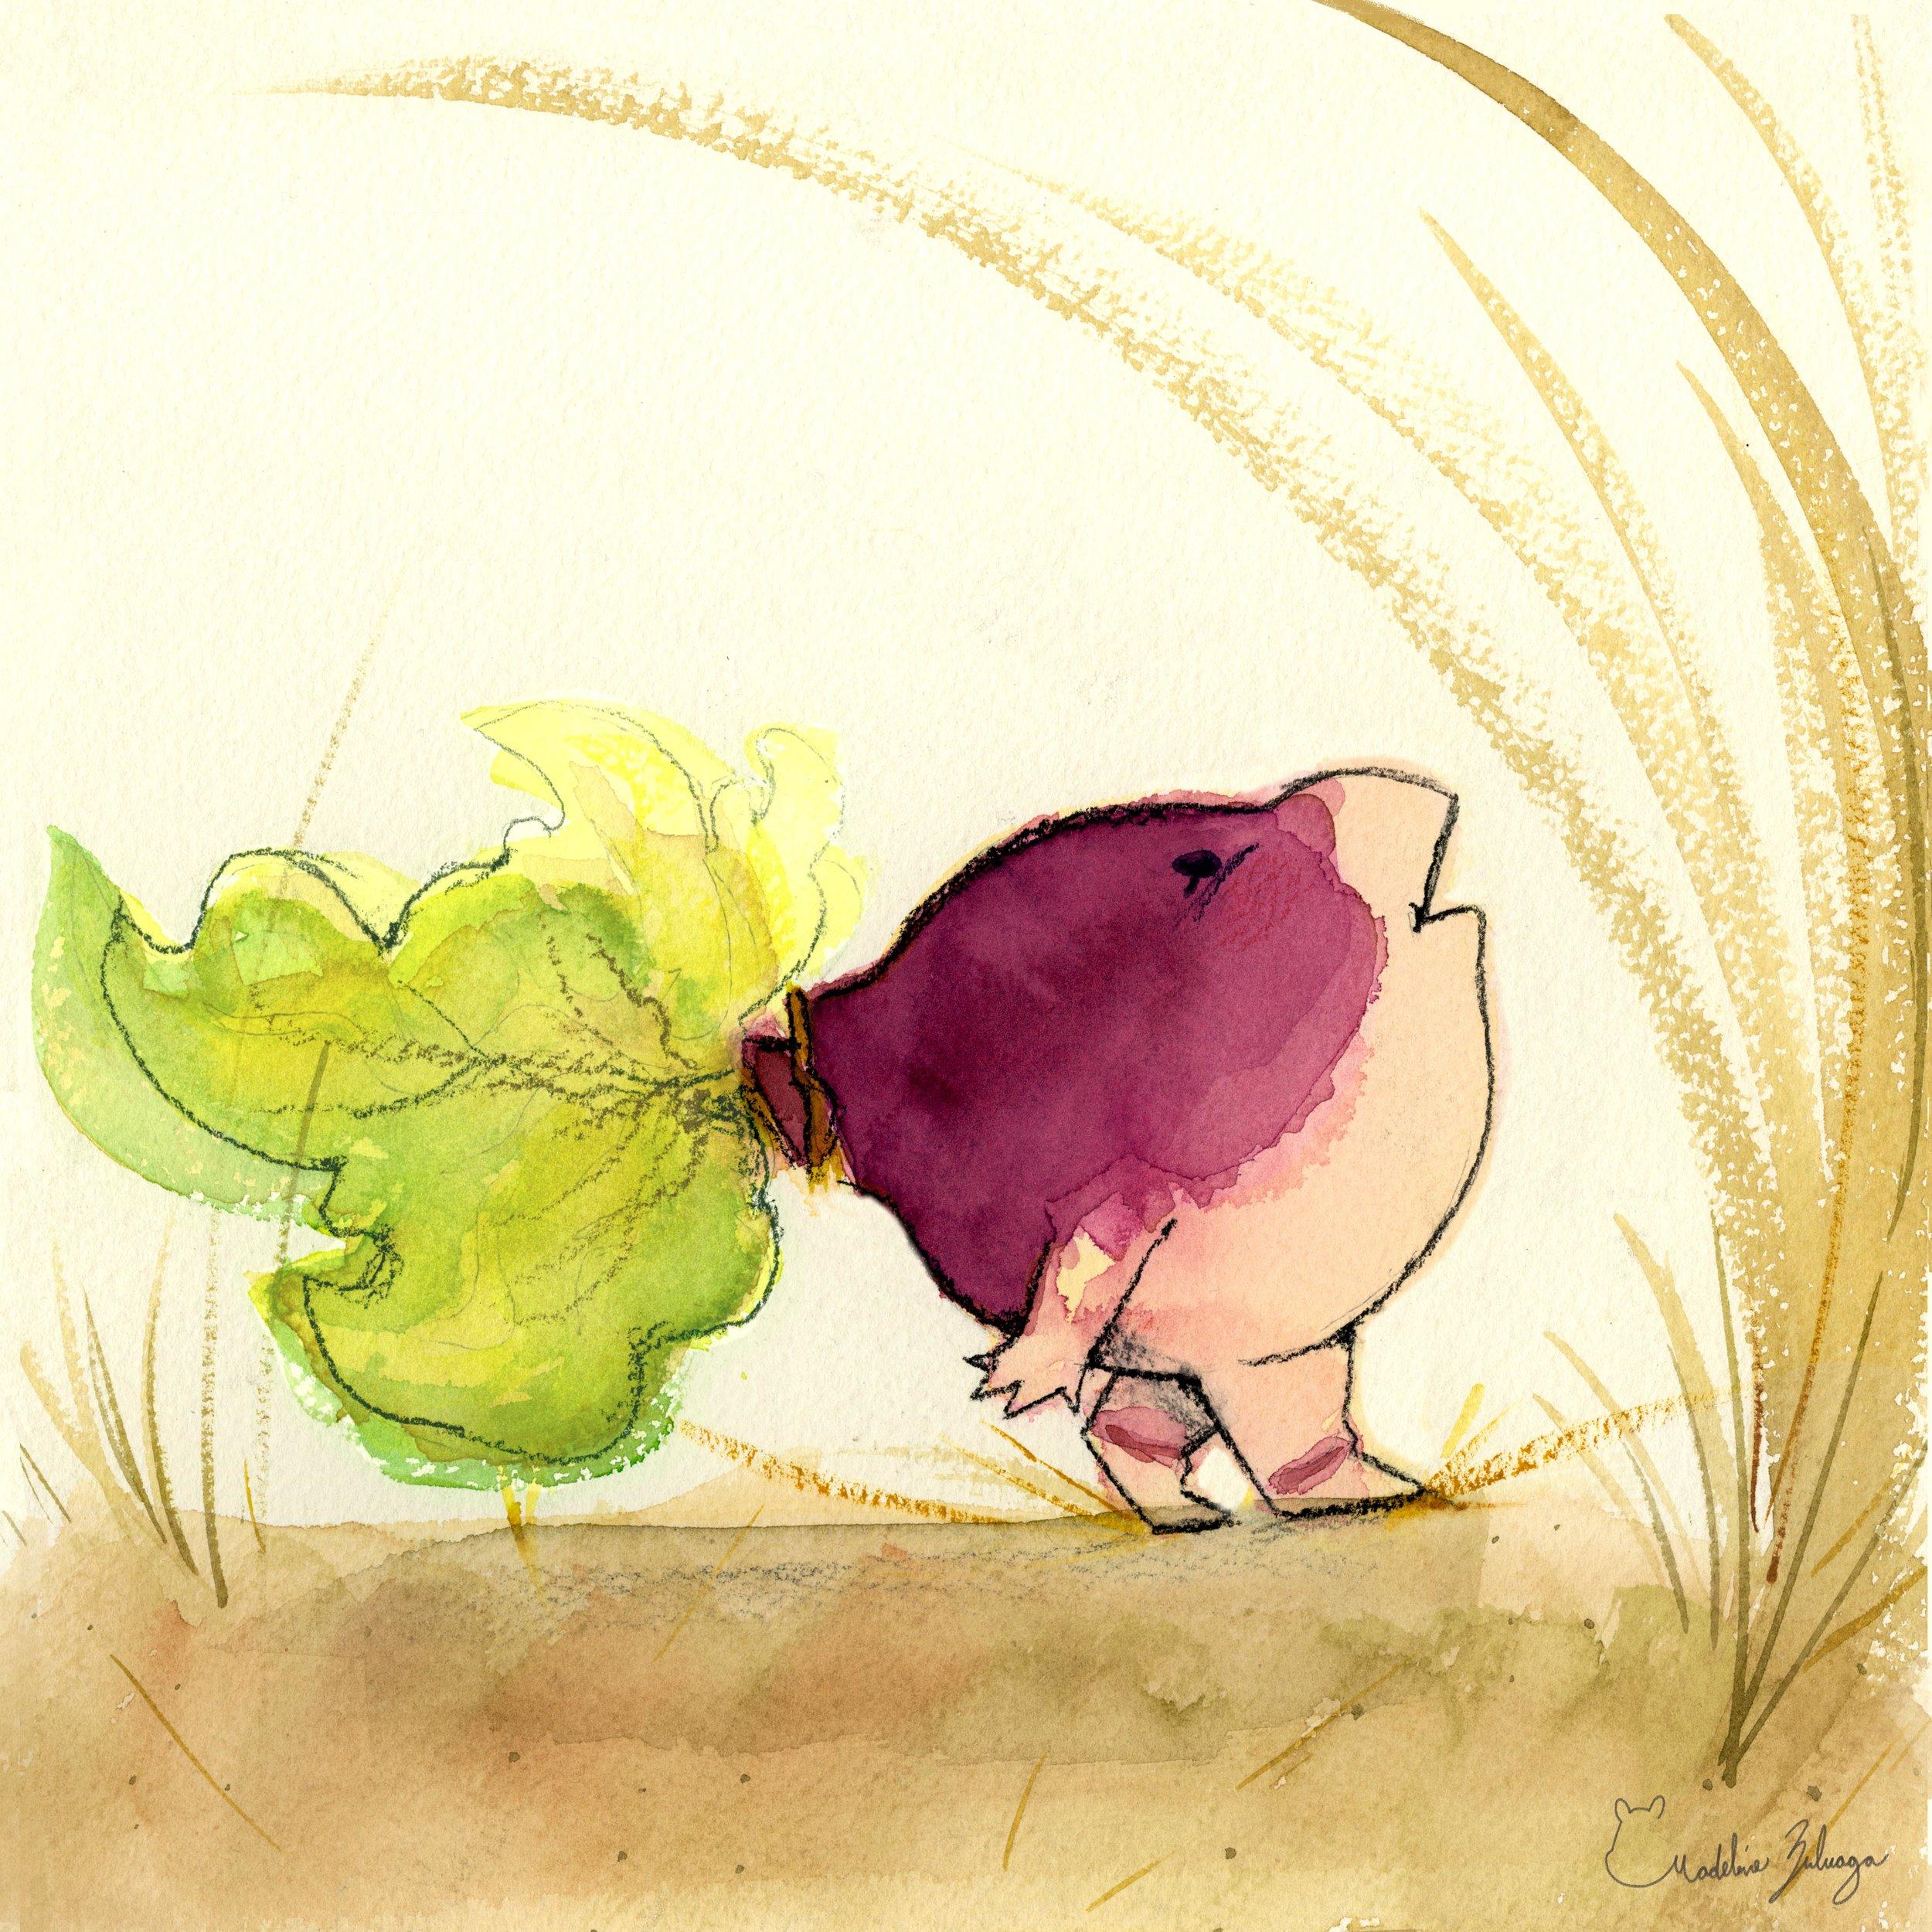 Madeline-zuluaga-Turnip-child-vignette-2.jpg